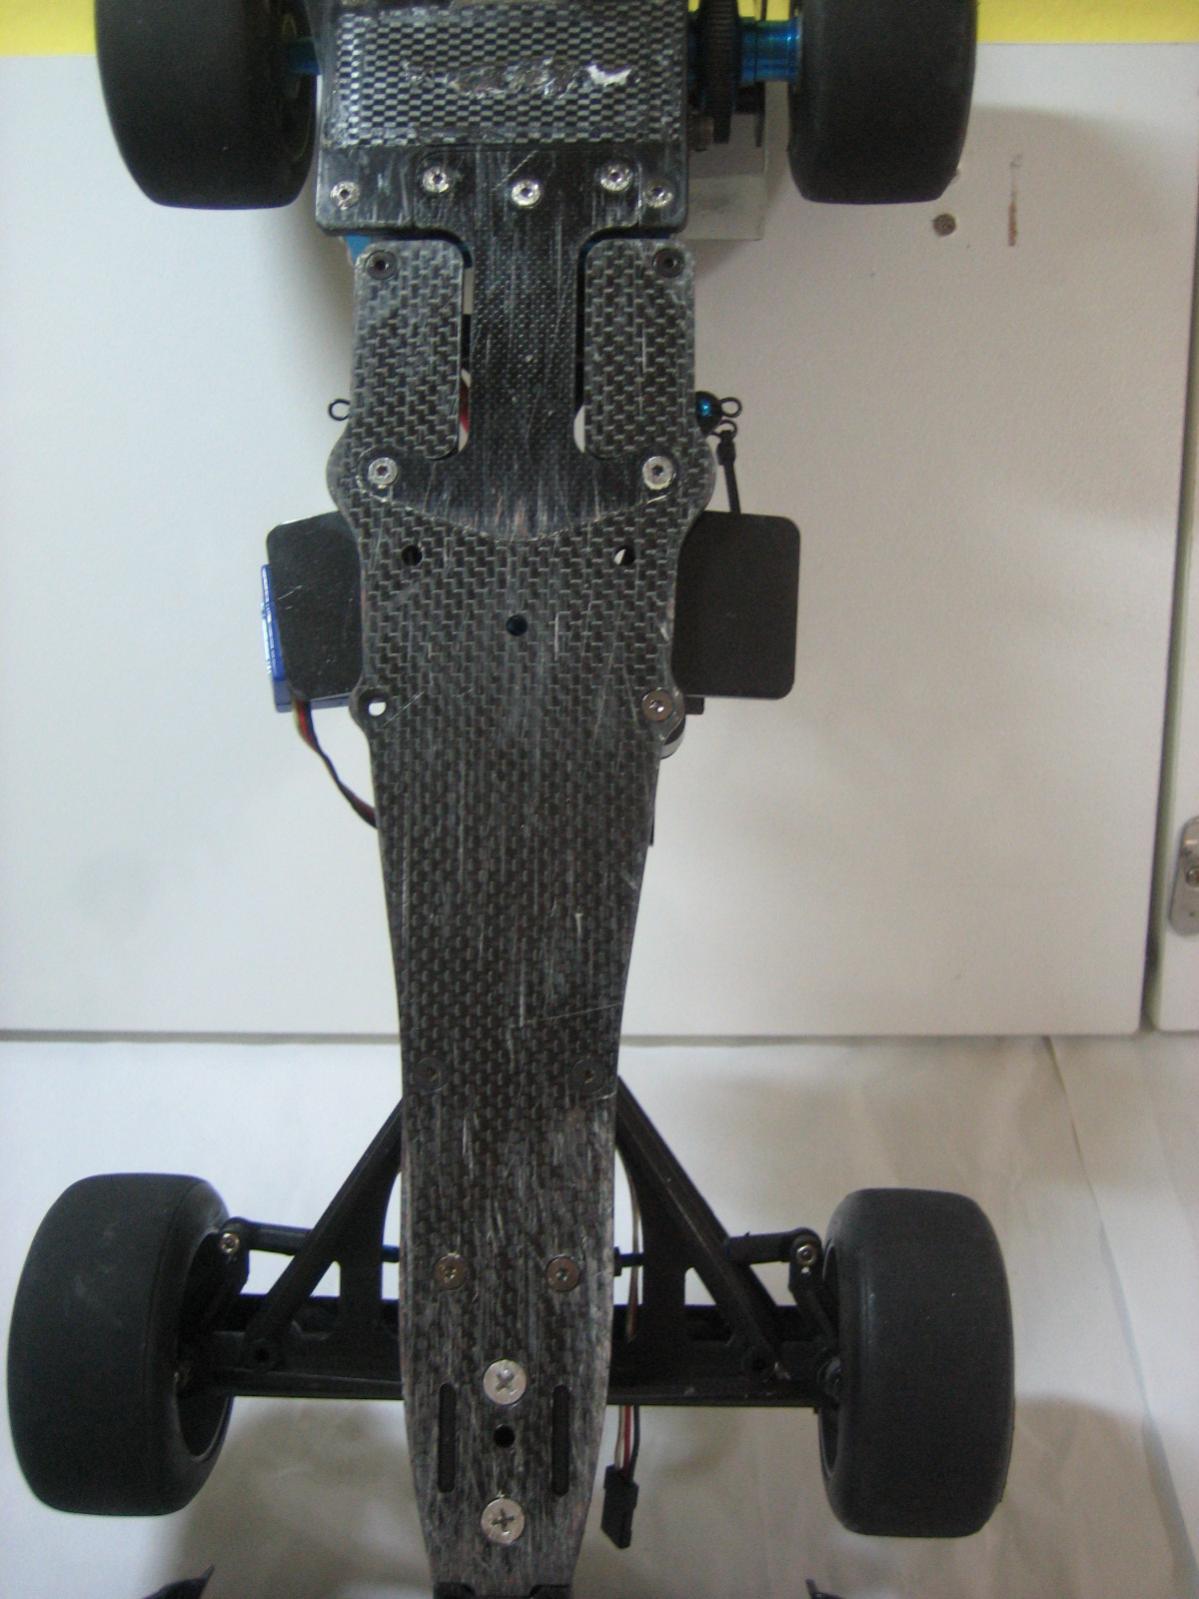 Tamiya F104 Pro Hop Ups F104 Pro With Hop Ups